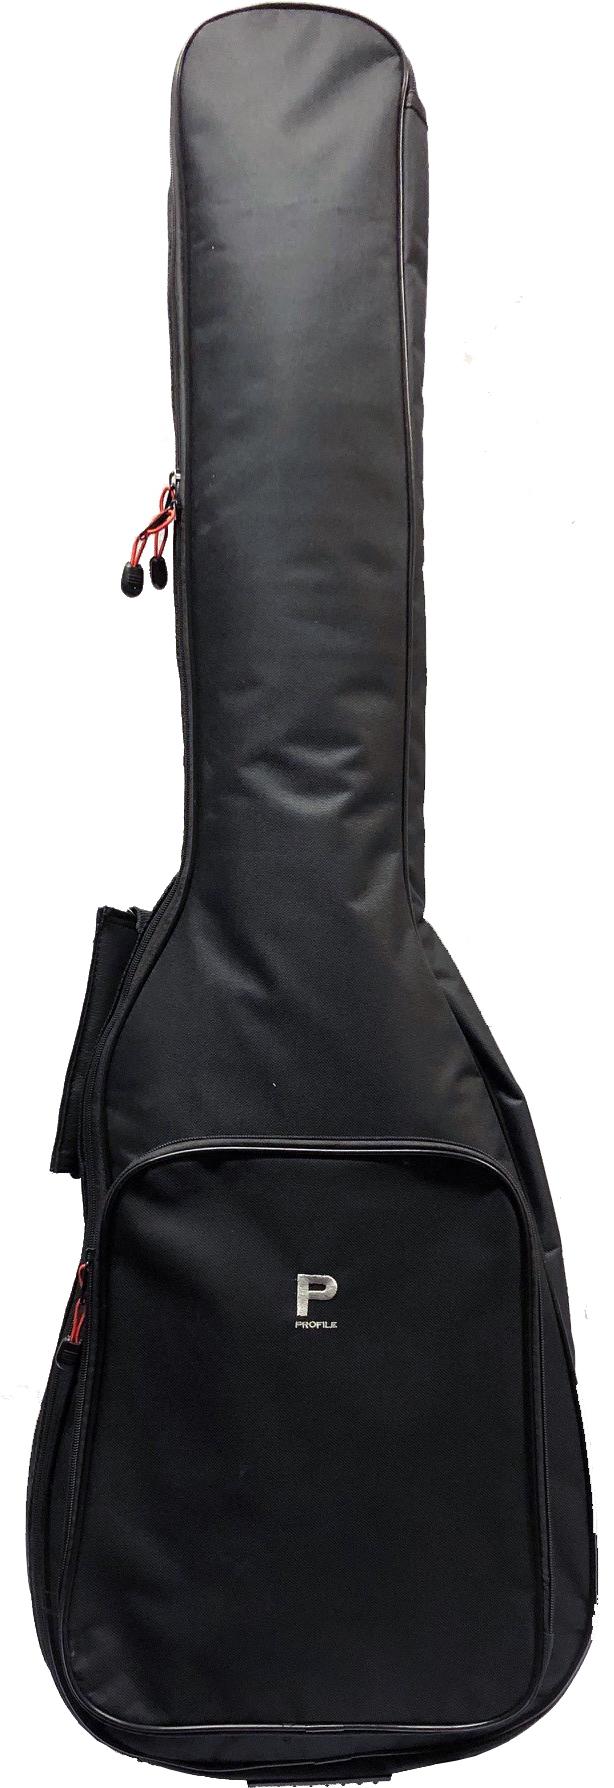 Profile PR50-EB Gig-Bag Electric Guitar